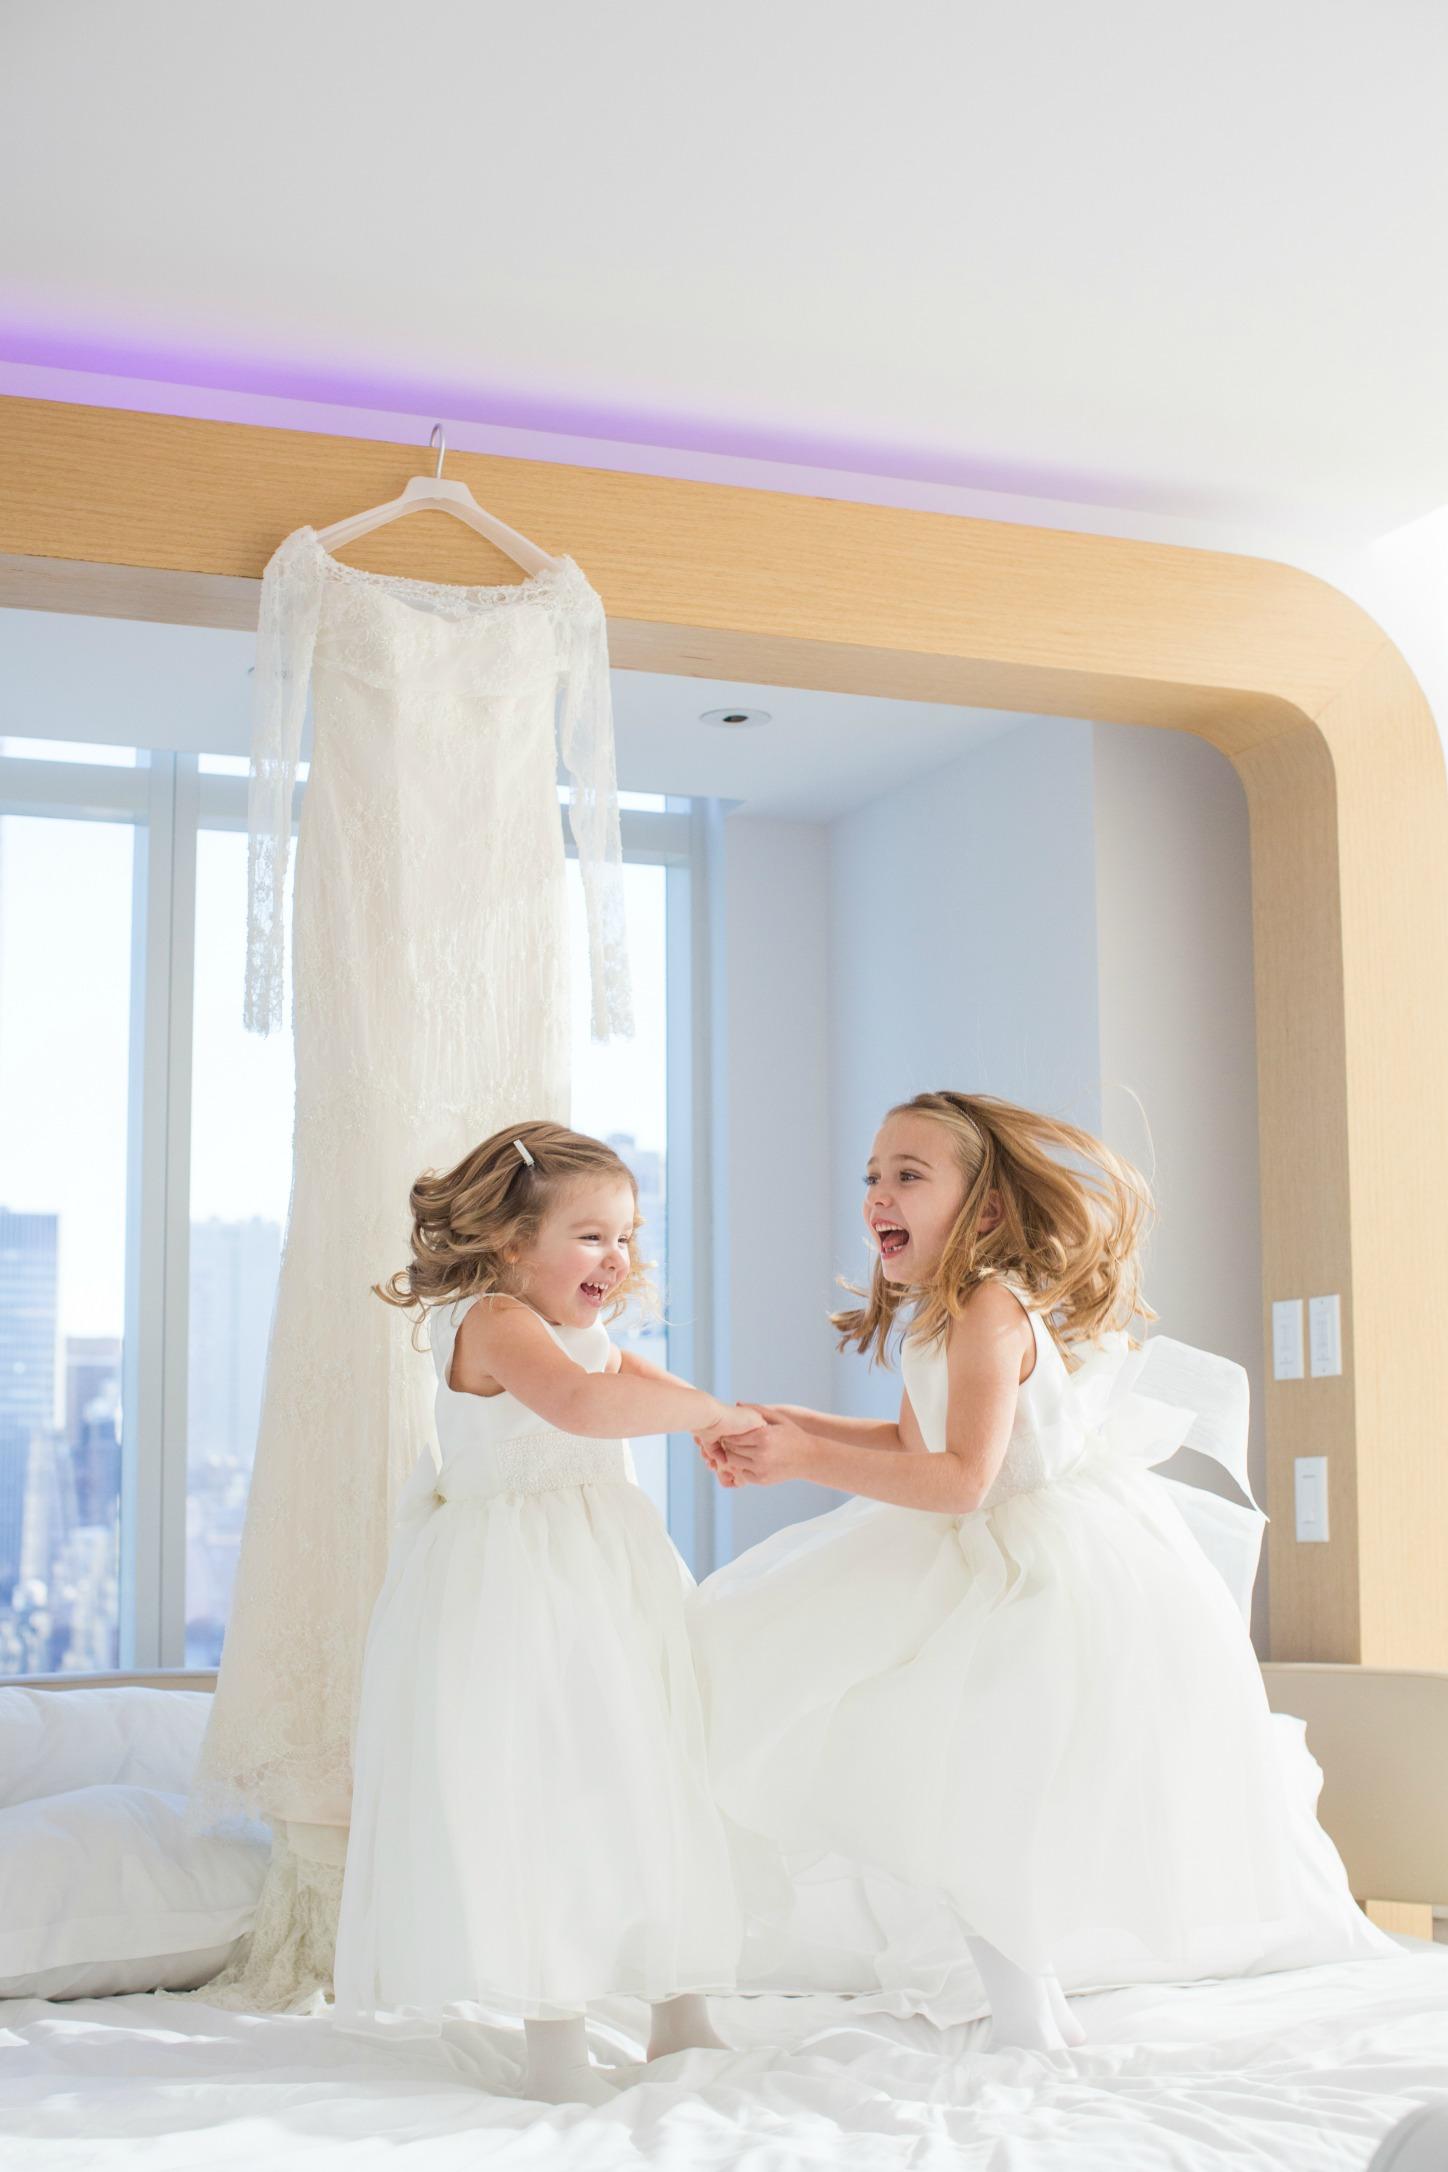 NYC Chic Winter Wedding ǀ Dee Kay Events ǀ Wedding Consultant ǀ Wedding Design ǀ New York Wedding Dress